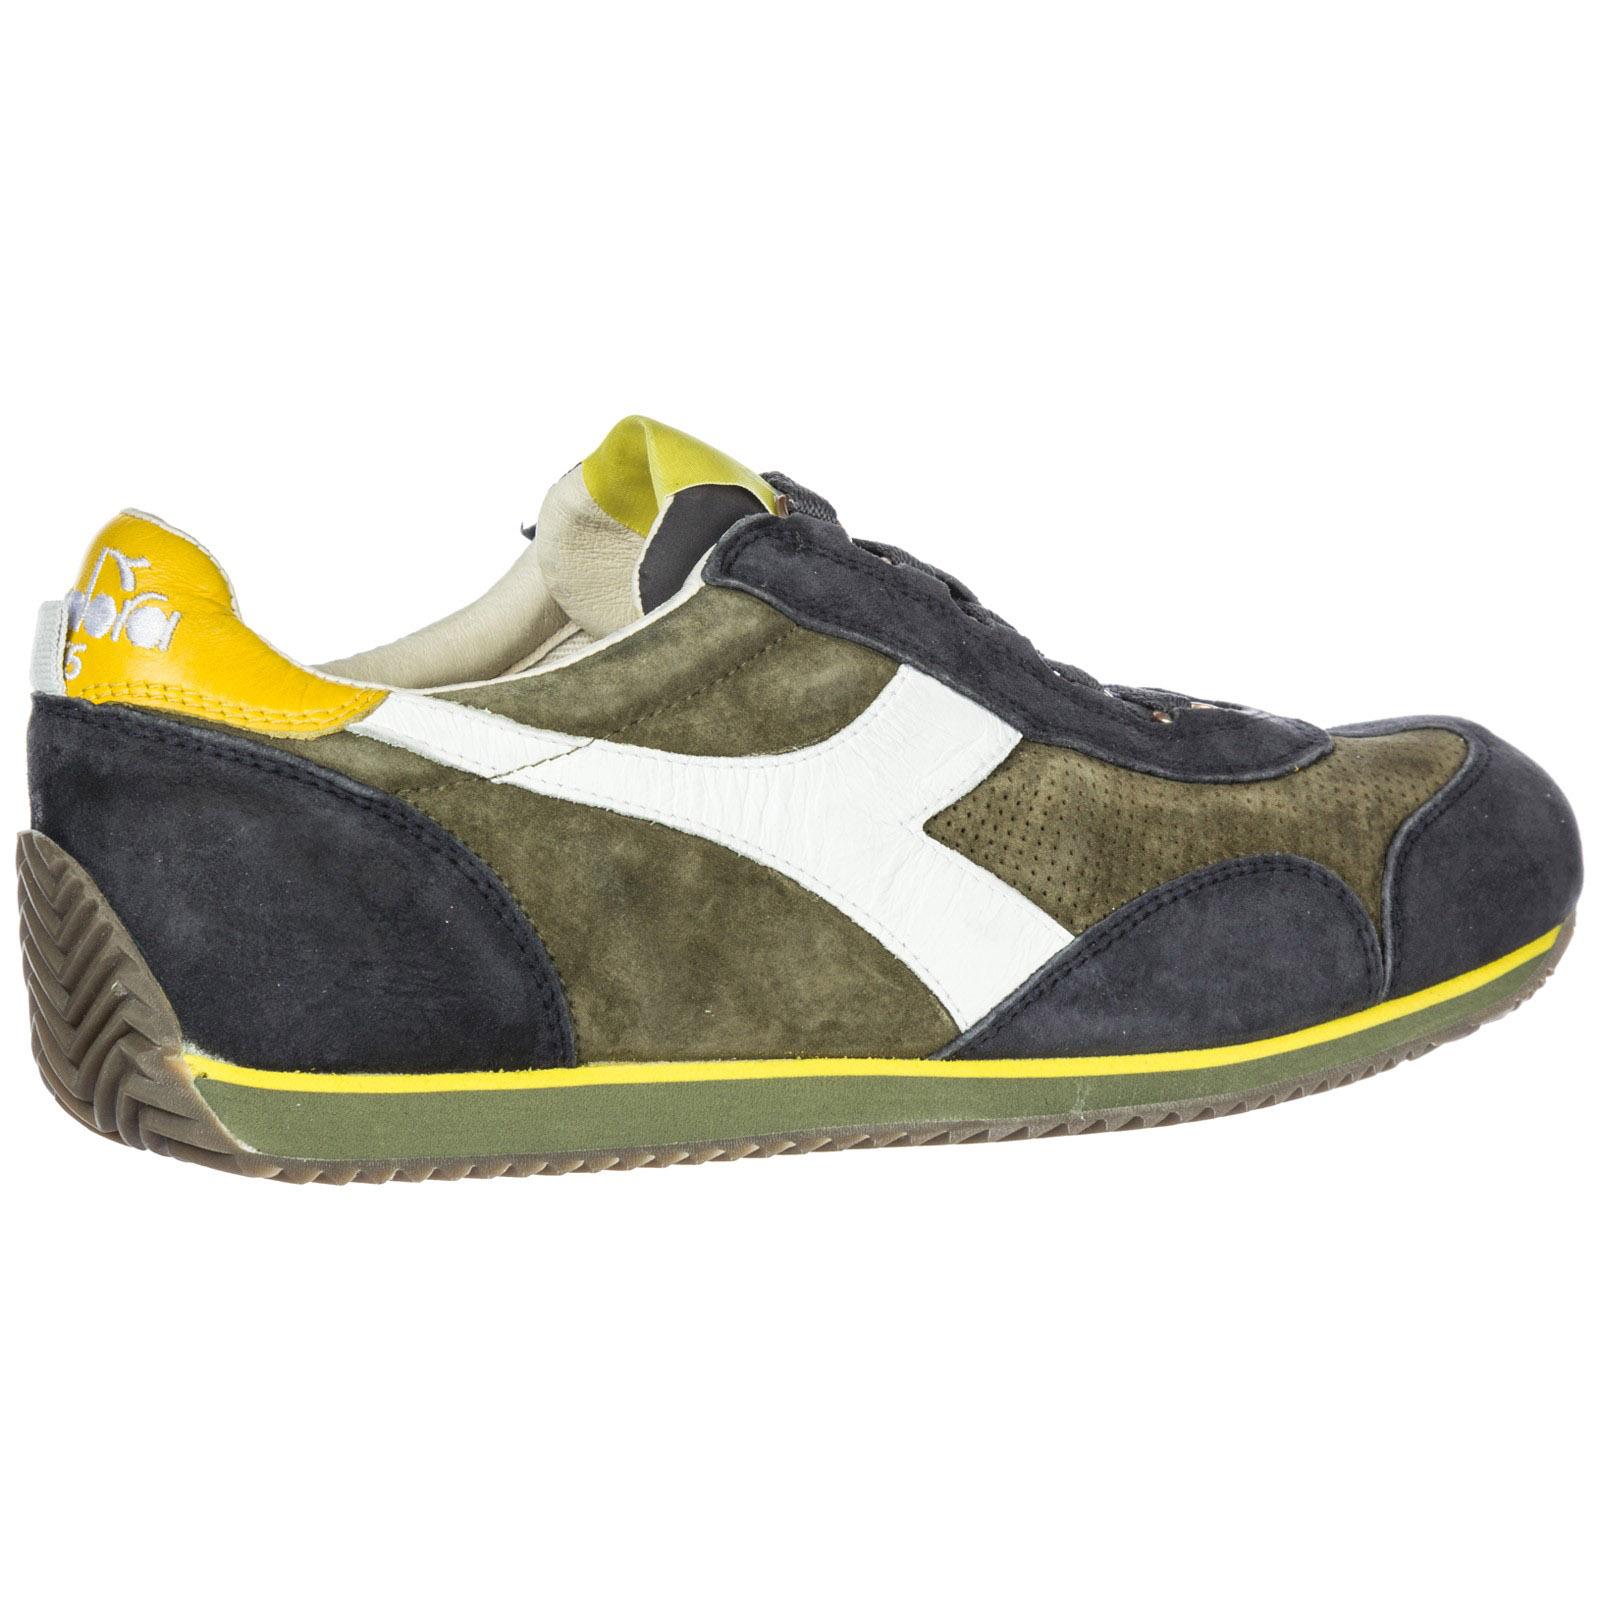 Sneakers Diadora Heritage Equipe s sw 18 201.173900 burnt olive ... 50b5fb32d33